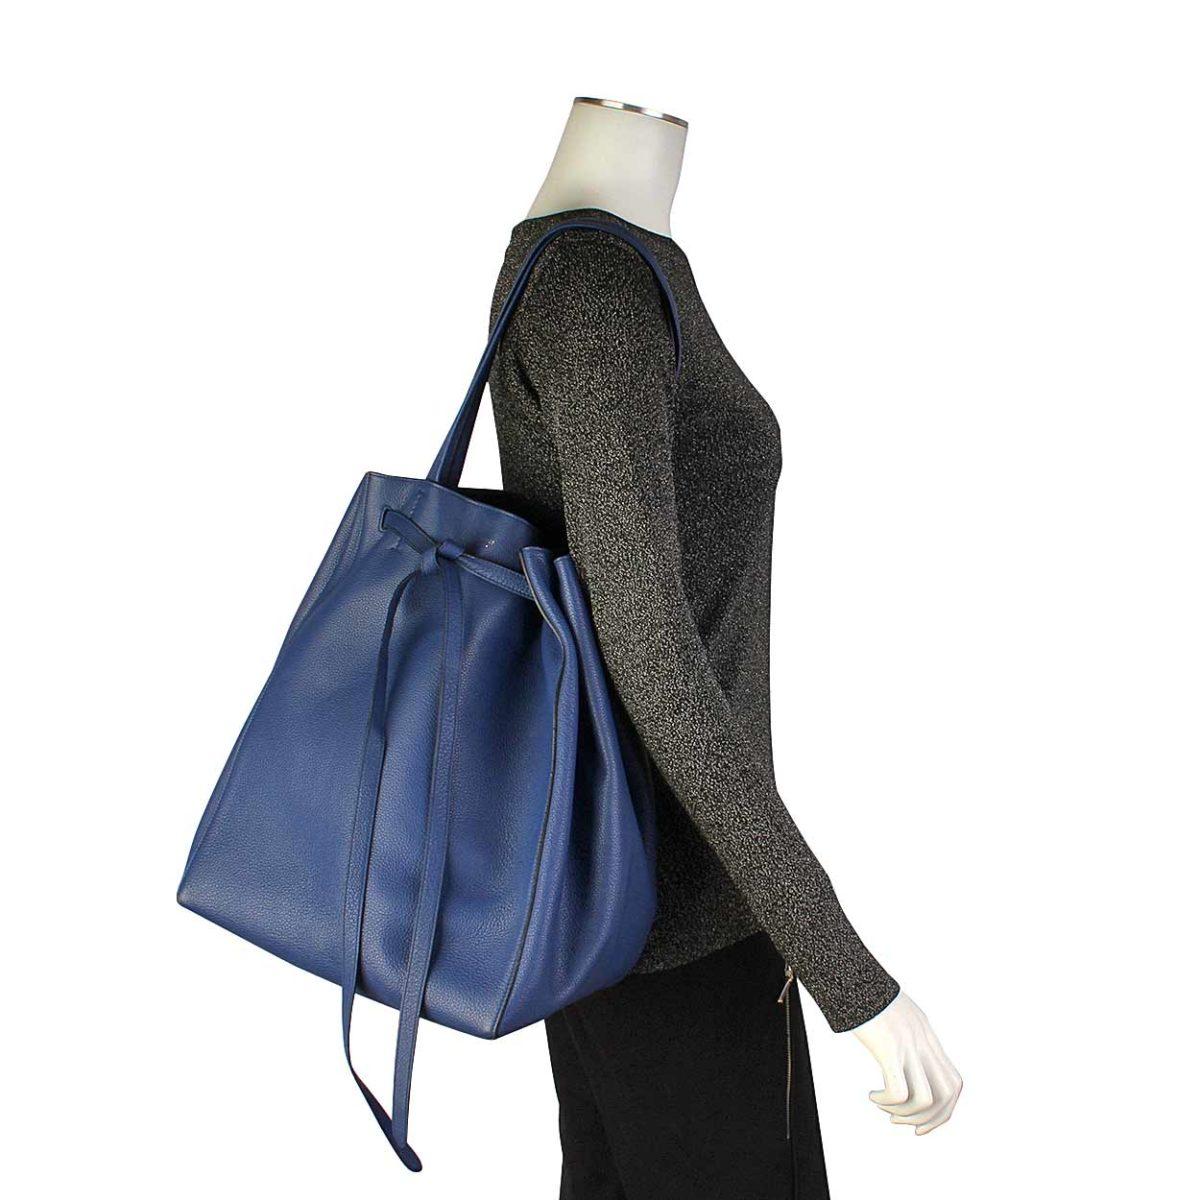 CELINE Leather Cabas Phantom Tote Blue  2fc9b4a2e5ead